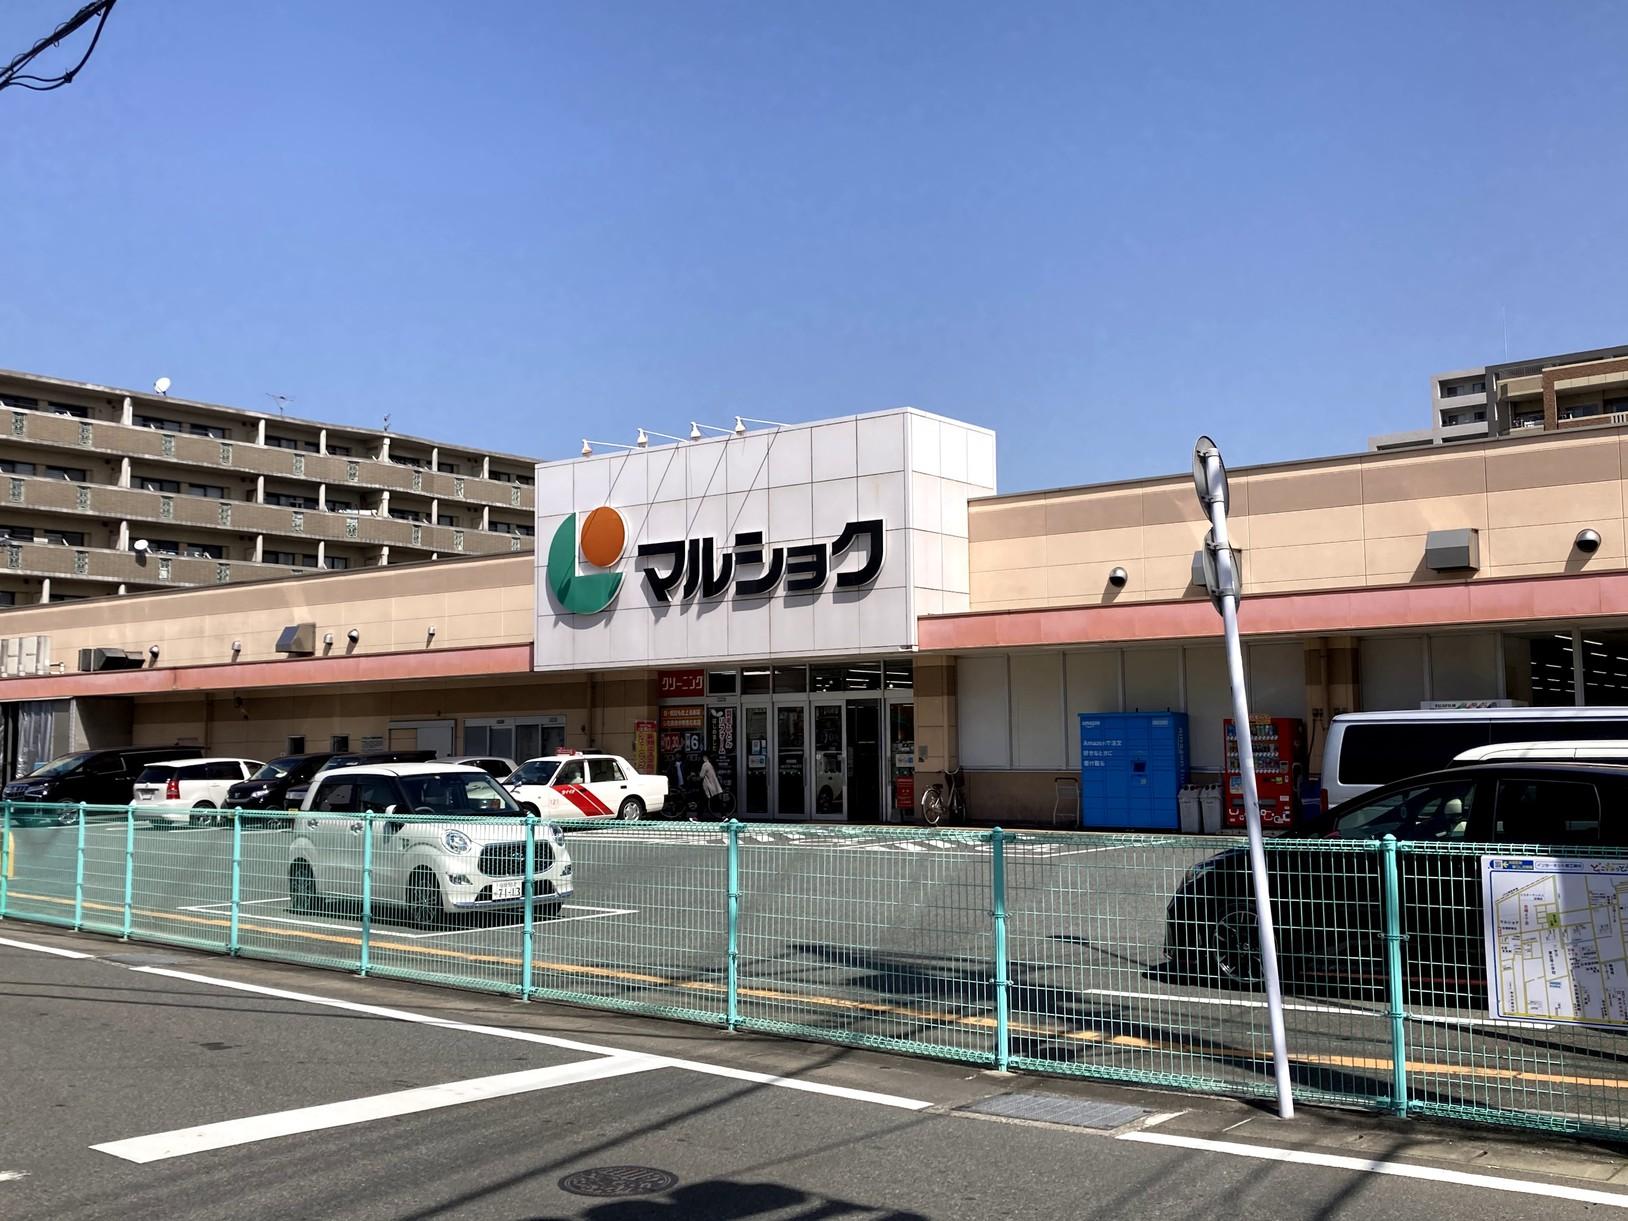 スーパー(徒歩10分圏内)